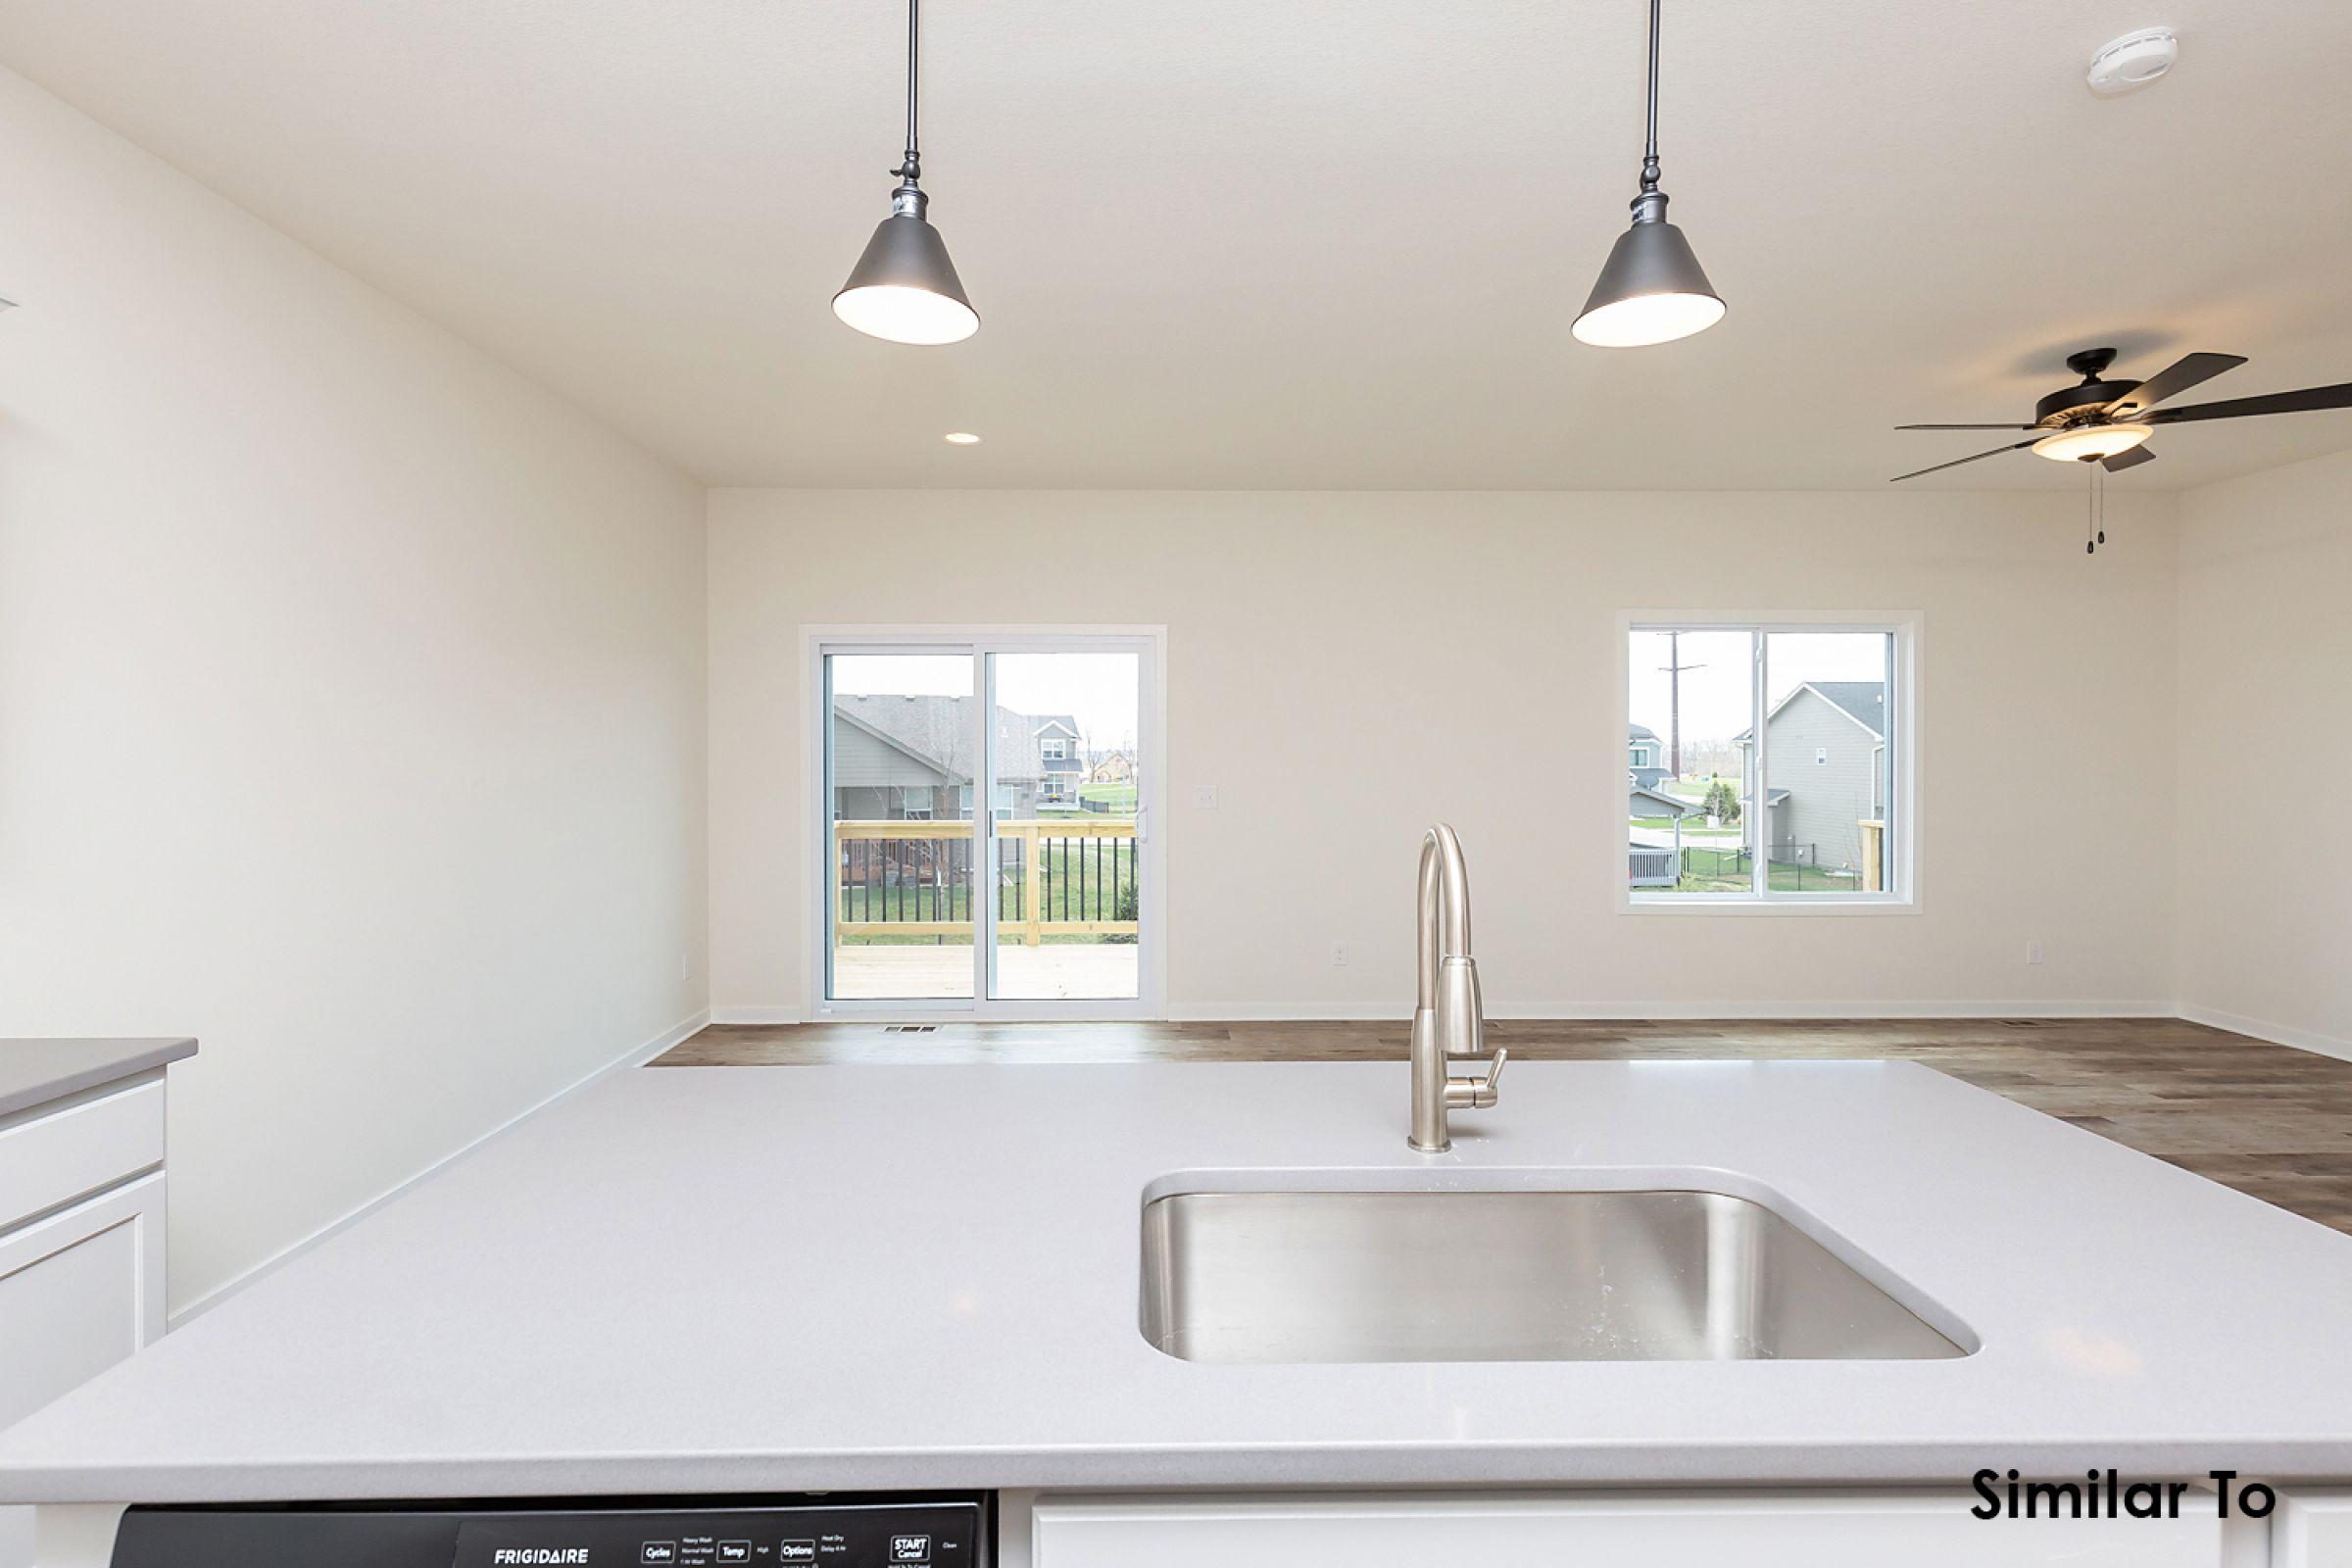 residential-warren-county-iowa-0-acres-listing-number-15138-6-2020-08-28-172754.jpg